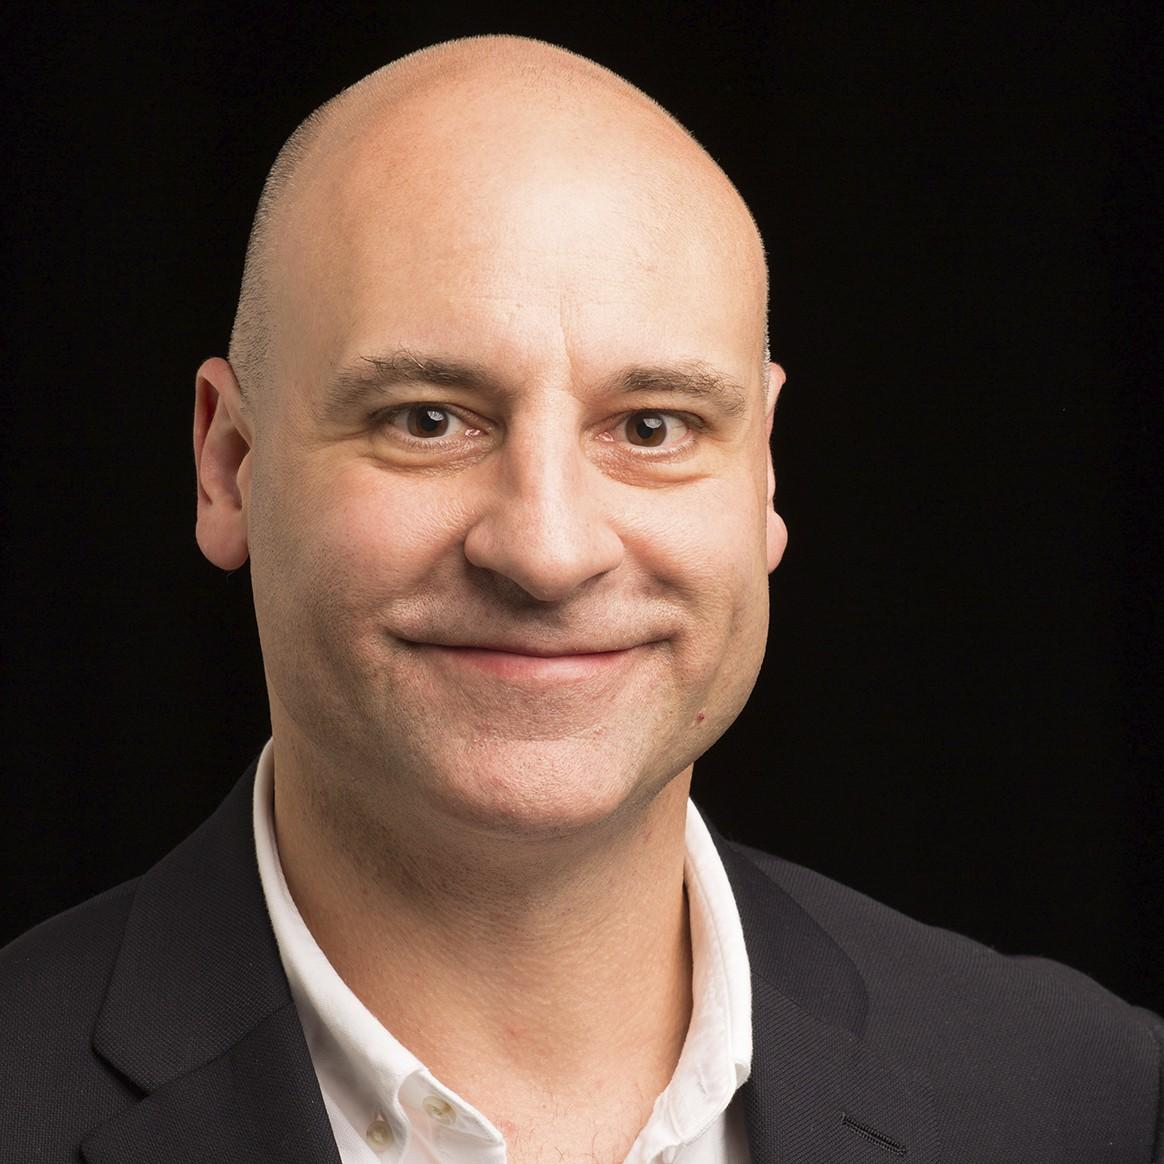 Head shot of Penn State Assistant Professor, Theatre History and Criticism Sebastian Trainor